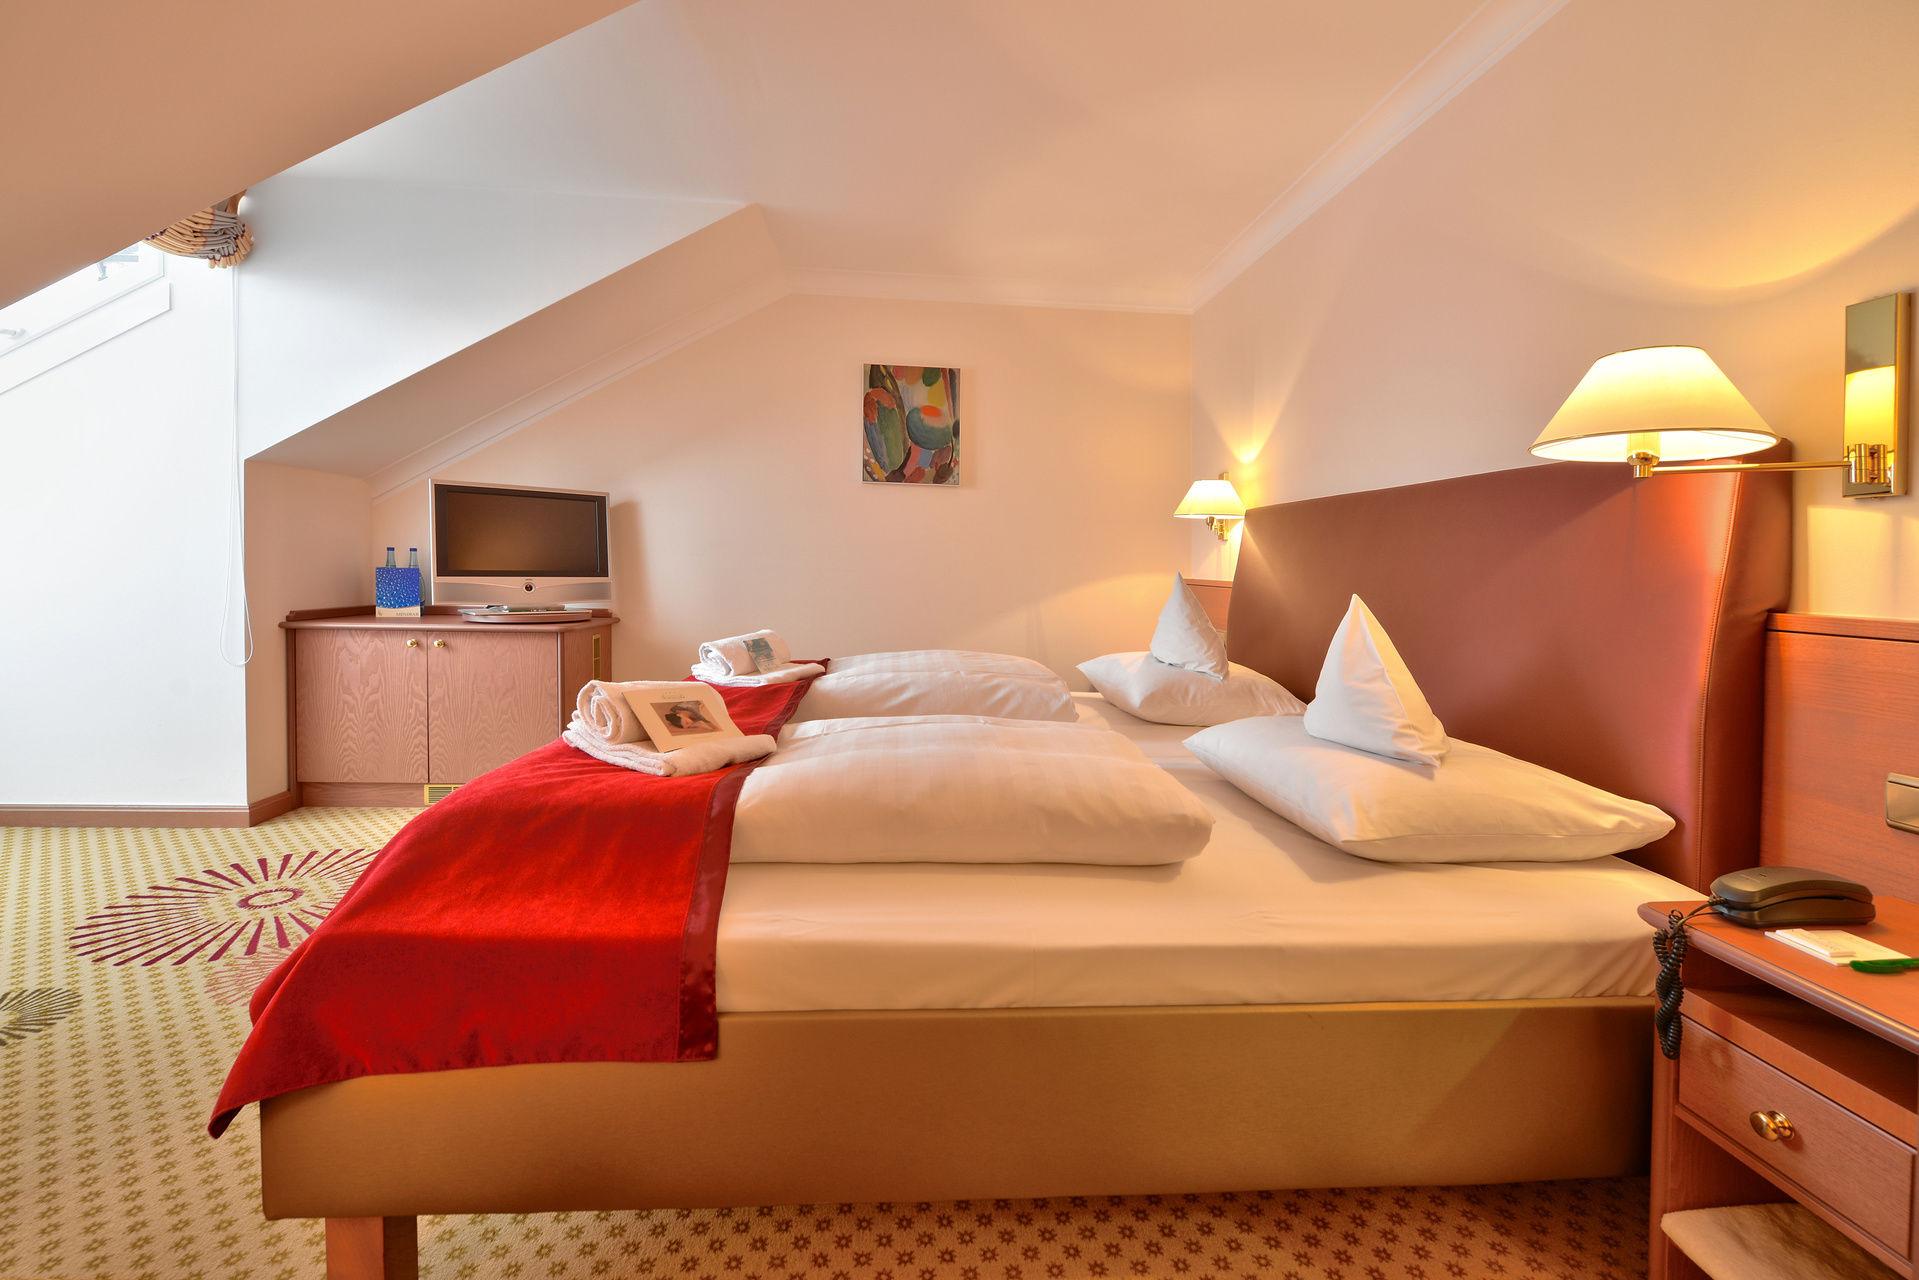 5 Sterne Hotel Amp Klinik St Wolfgang In Bad Griesbach Bei